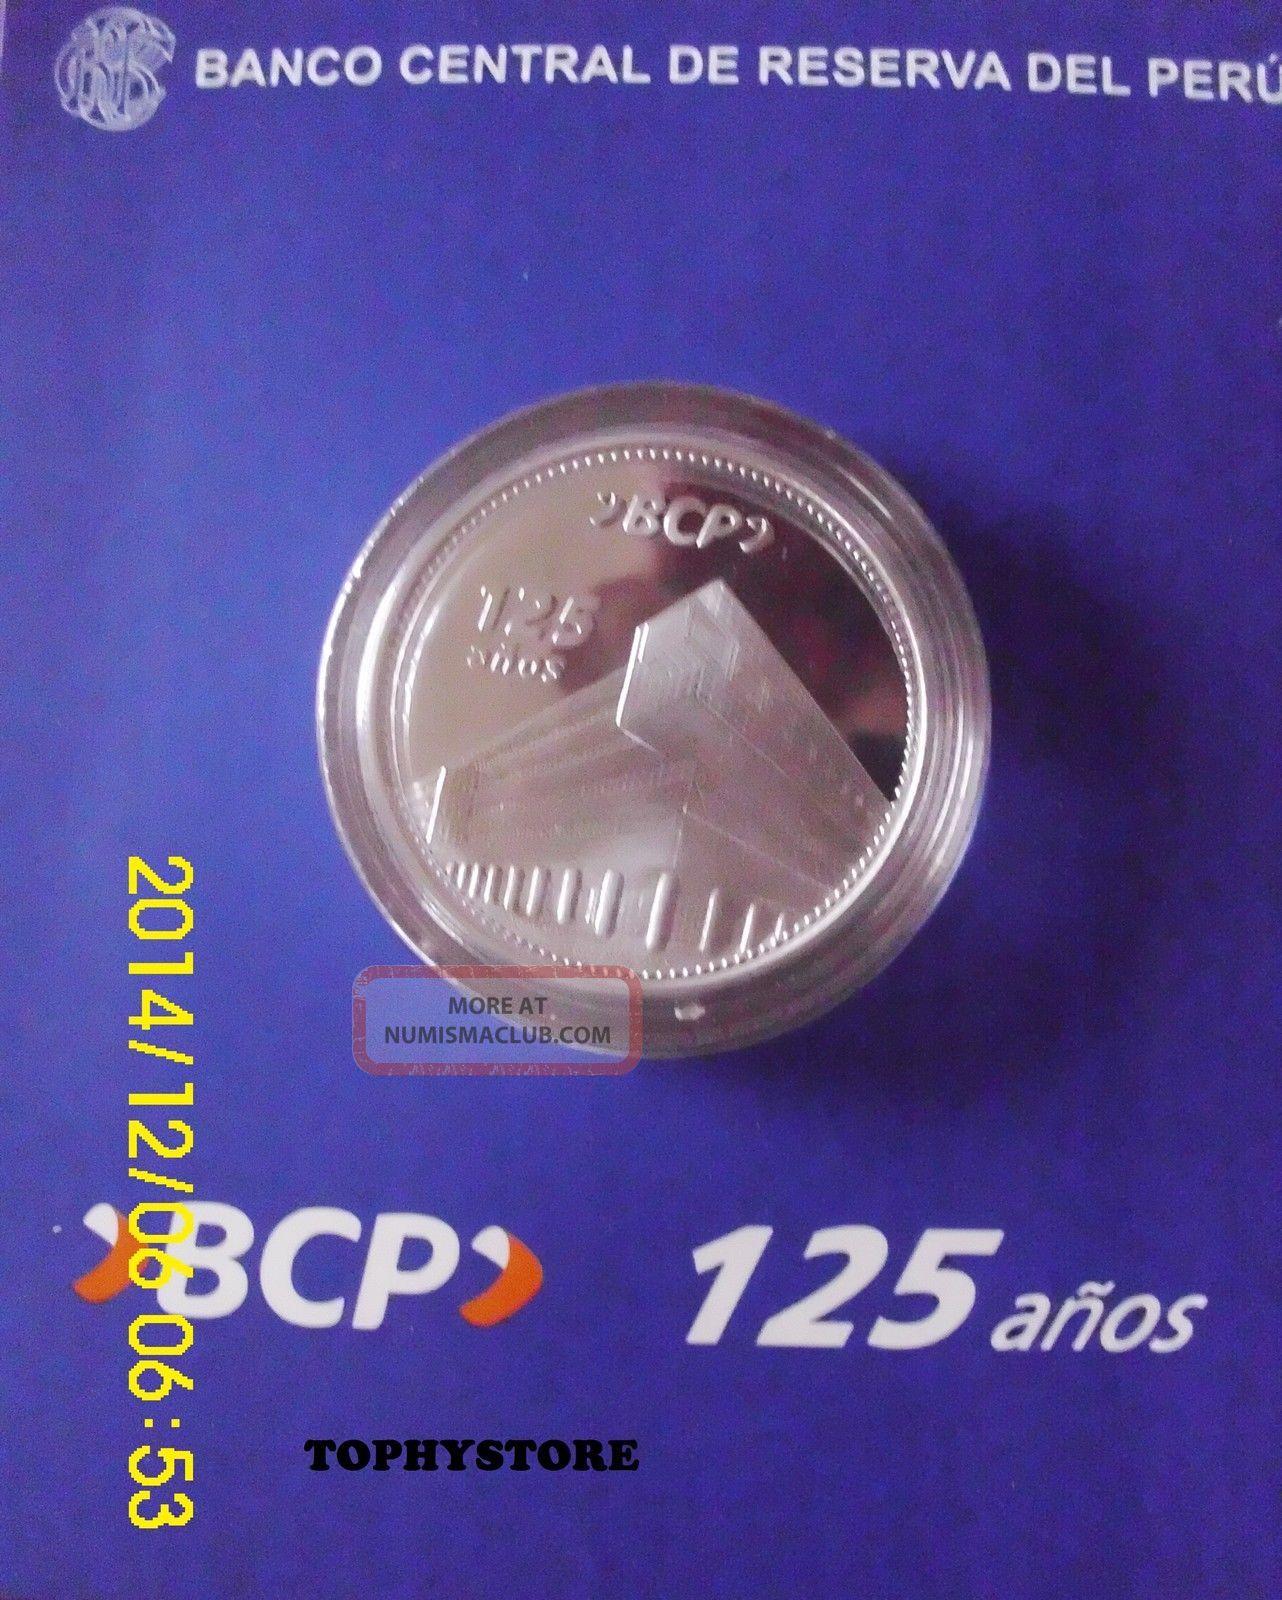 Bcp Bank Peru